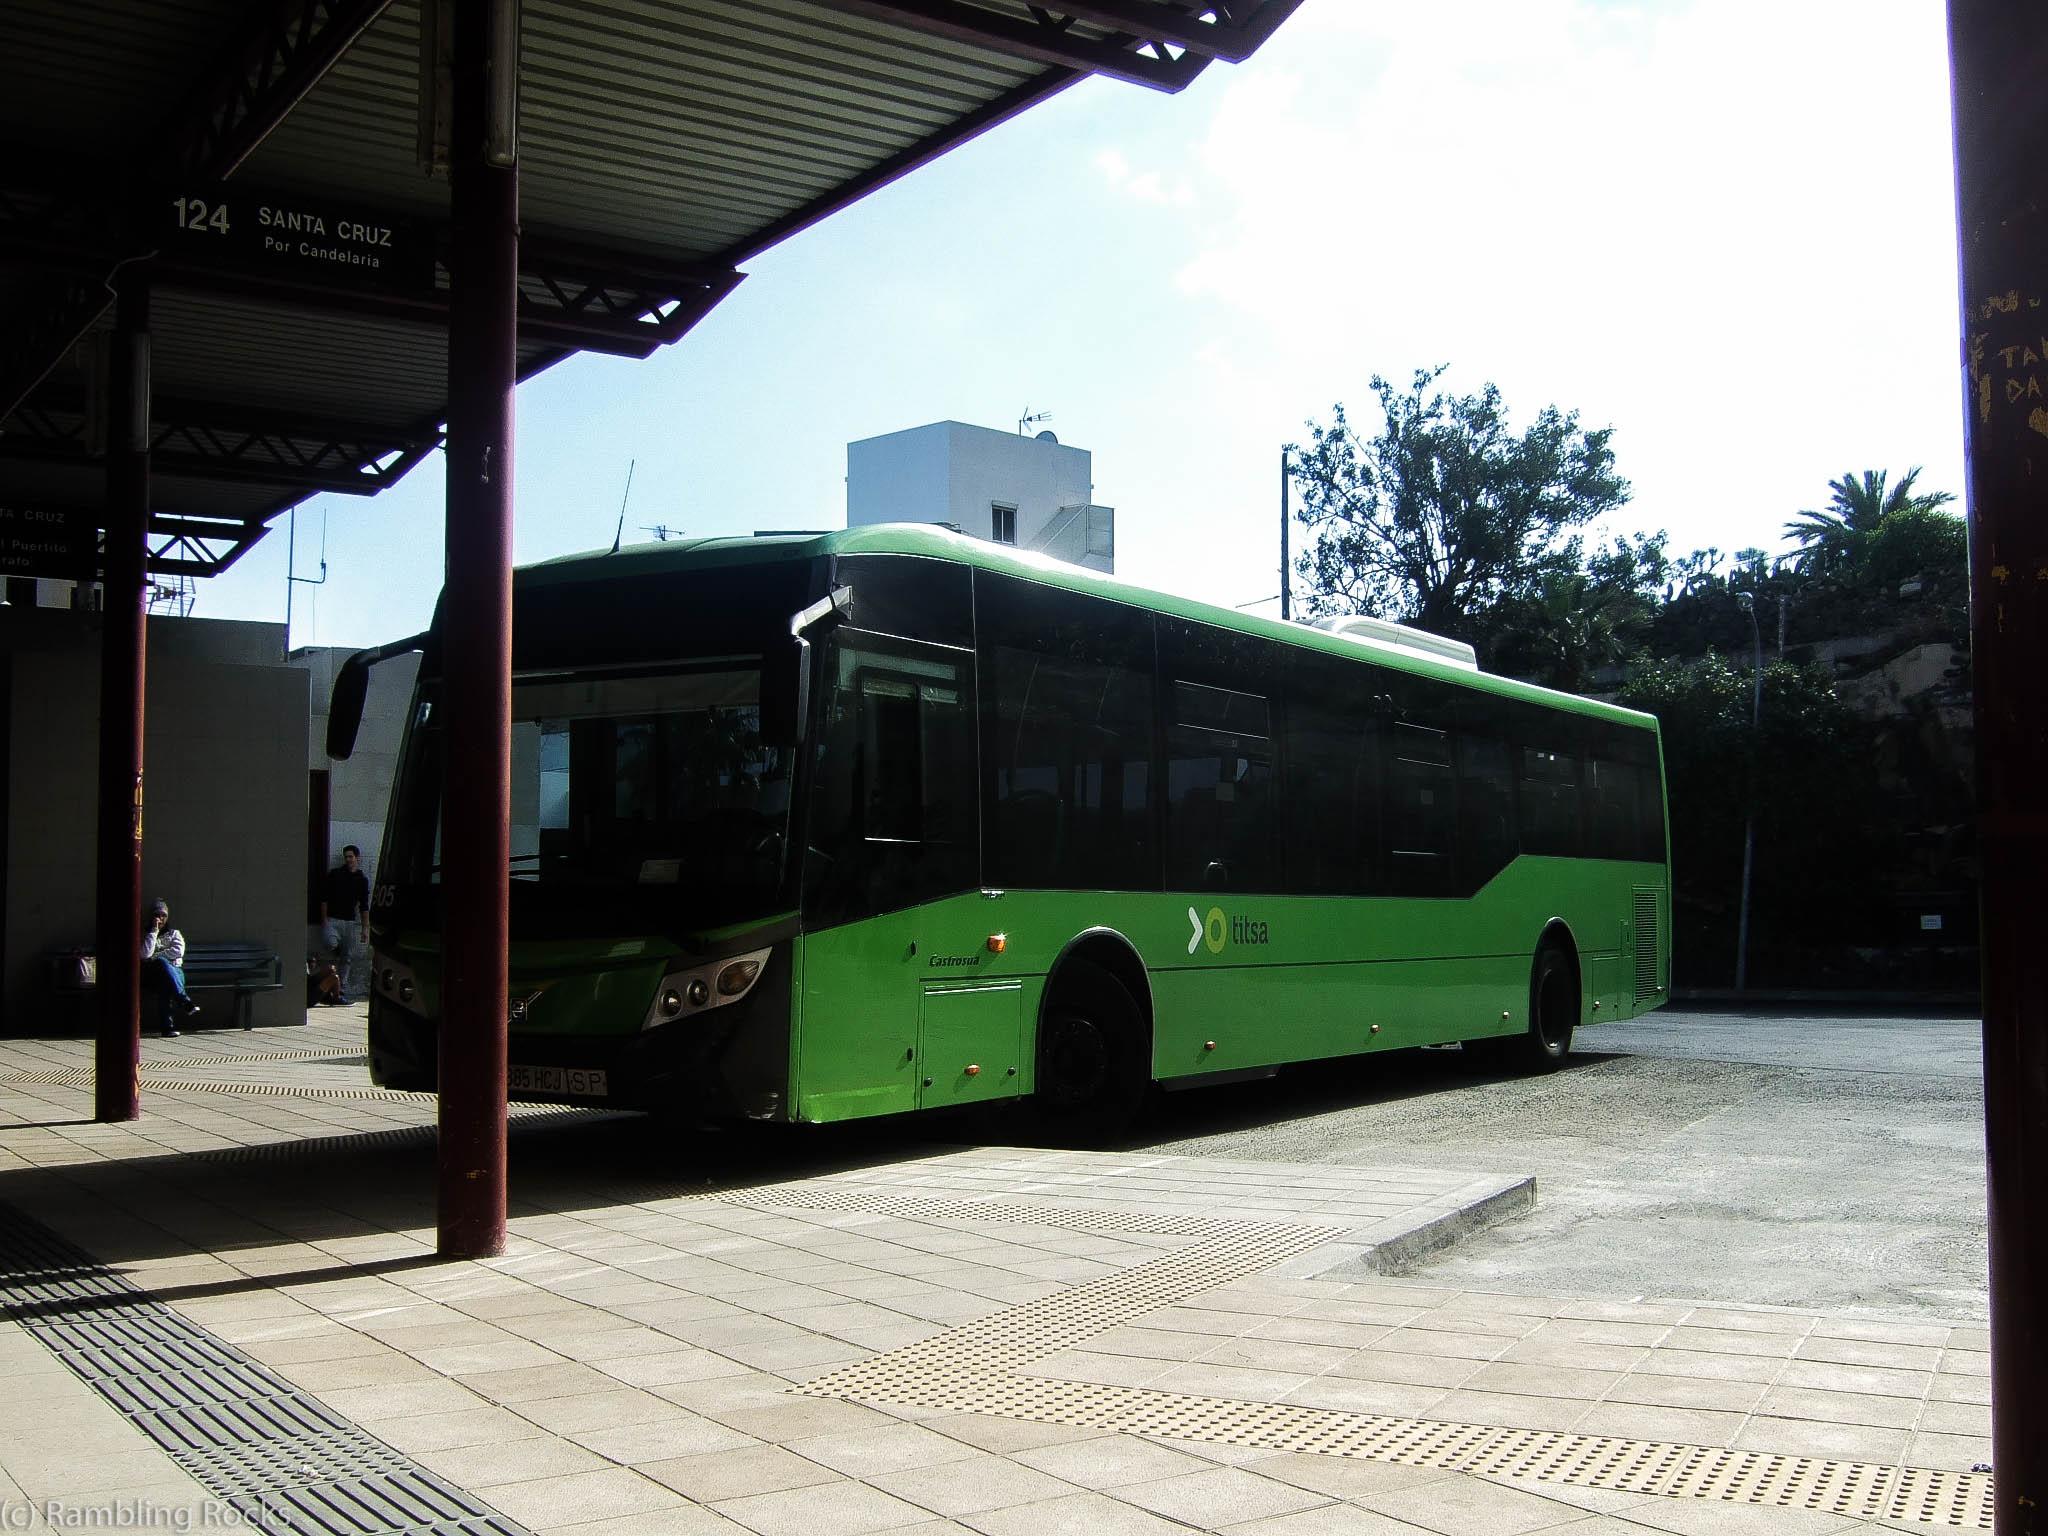 Bus Teneriffa